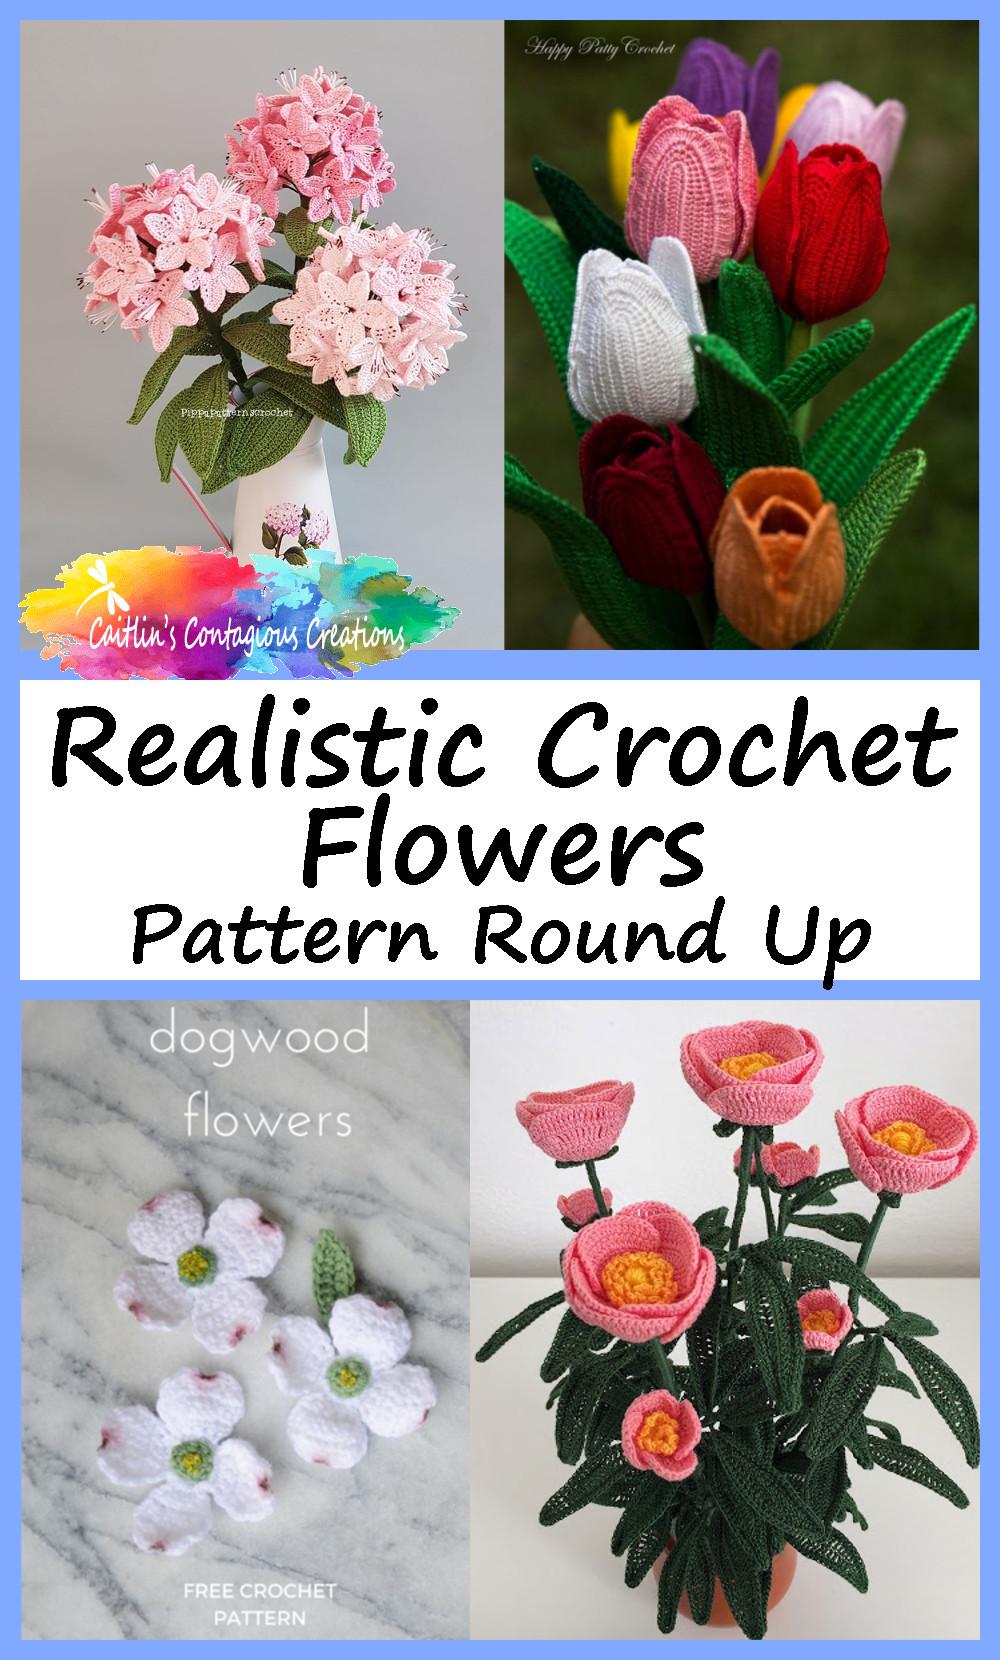 Fleur réaliste Crochet motif arrondir Pin Image 1 Rhododendron tulipe cornouiller pivoine fleurs